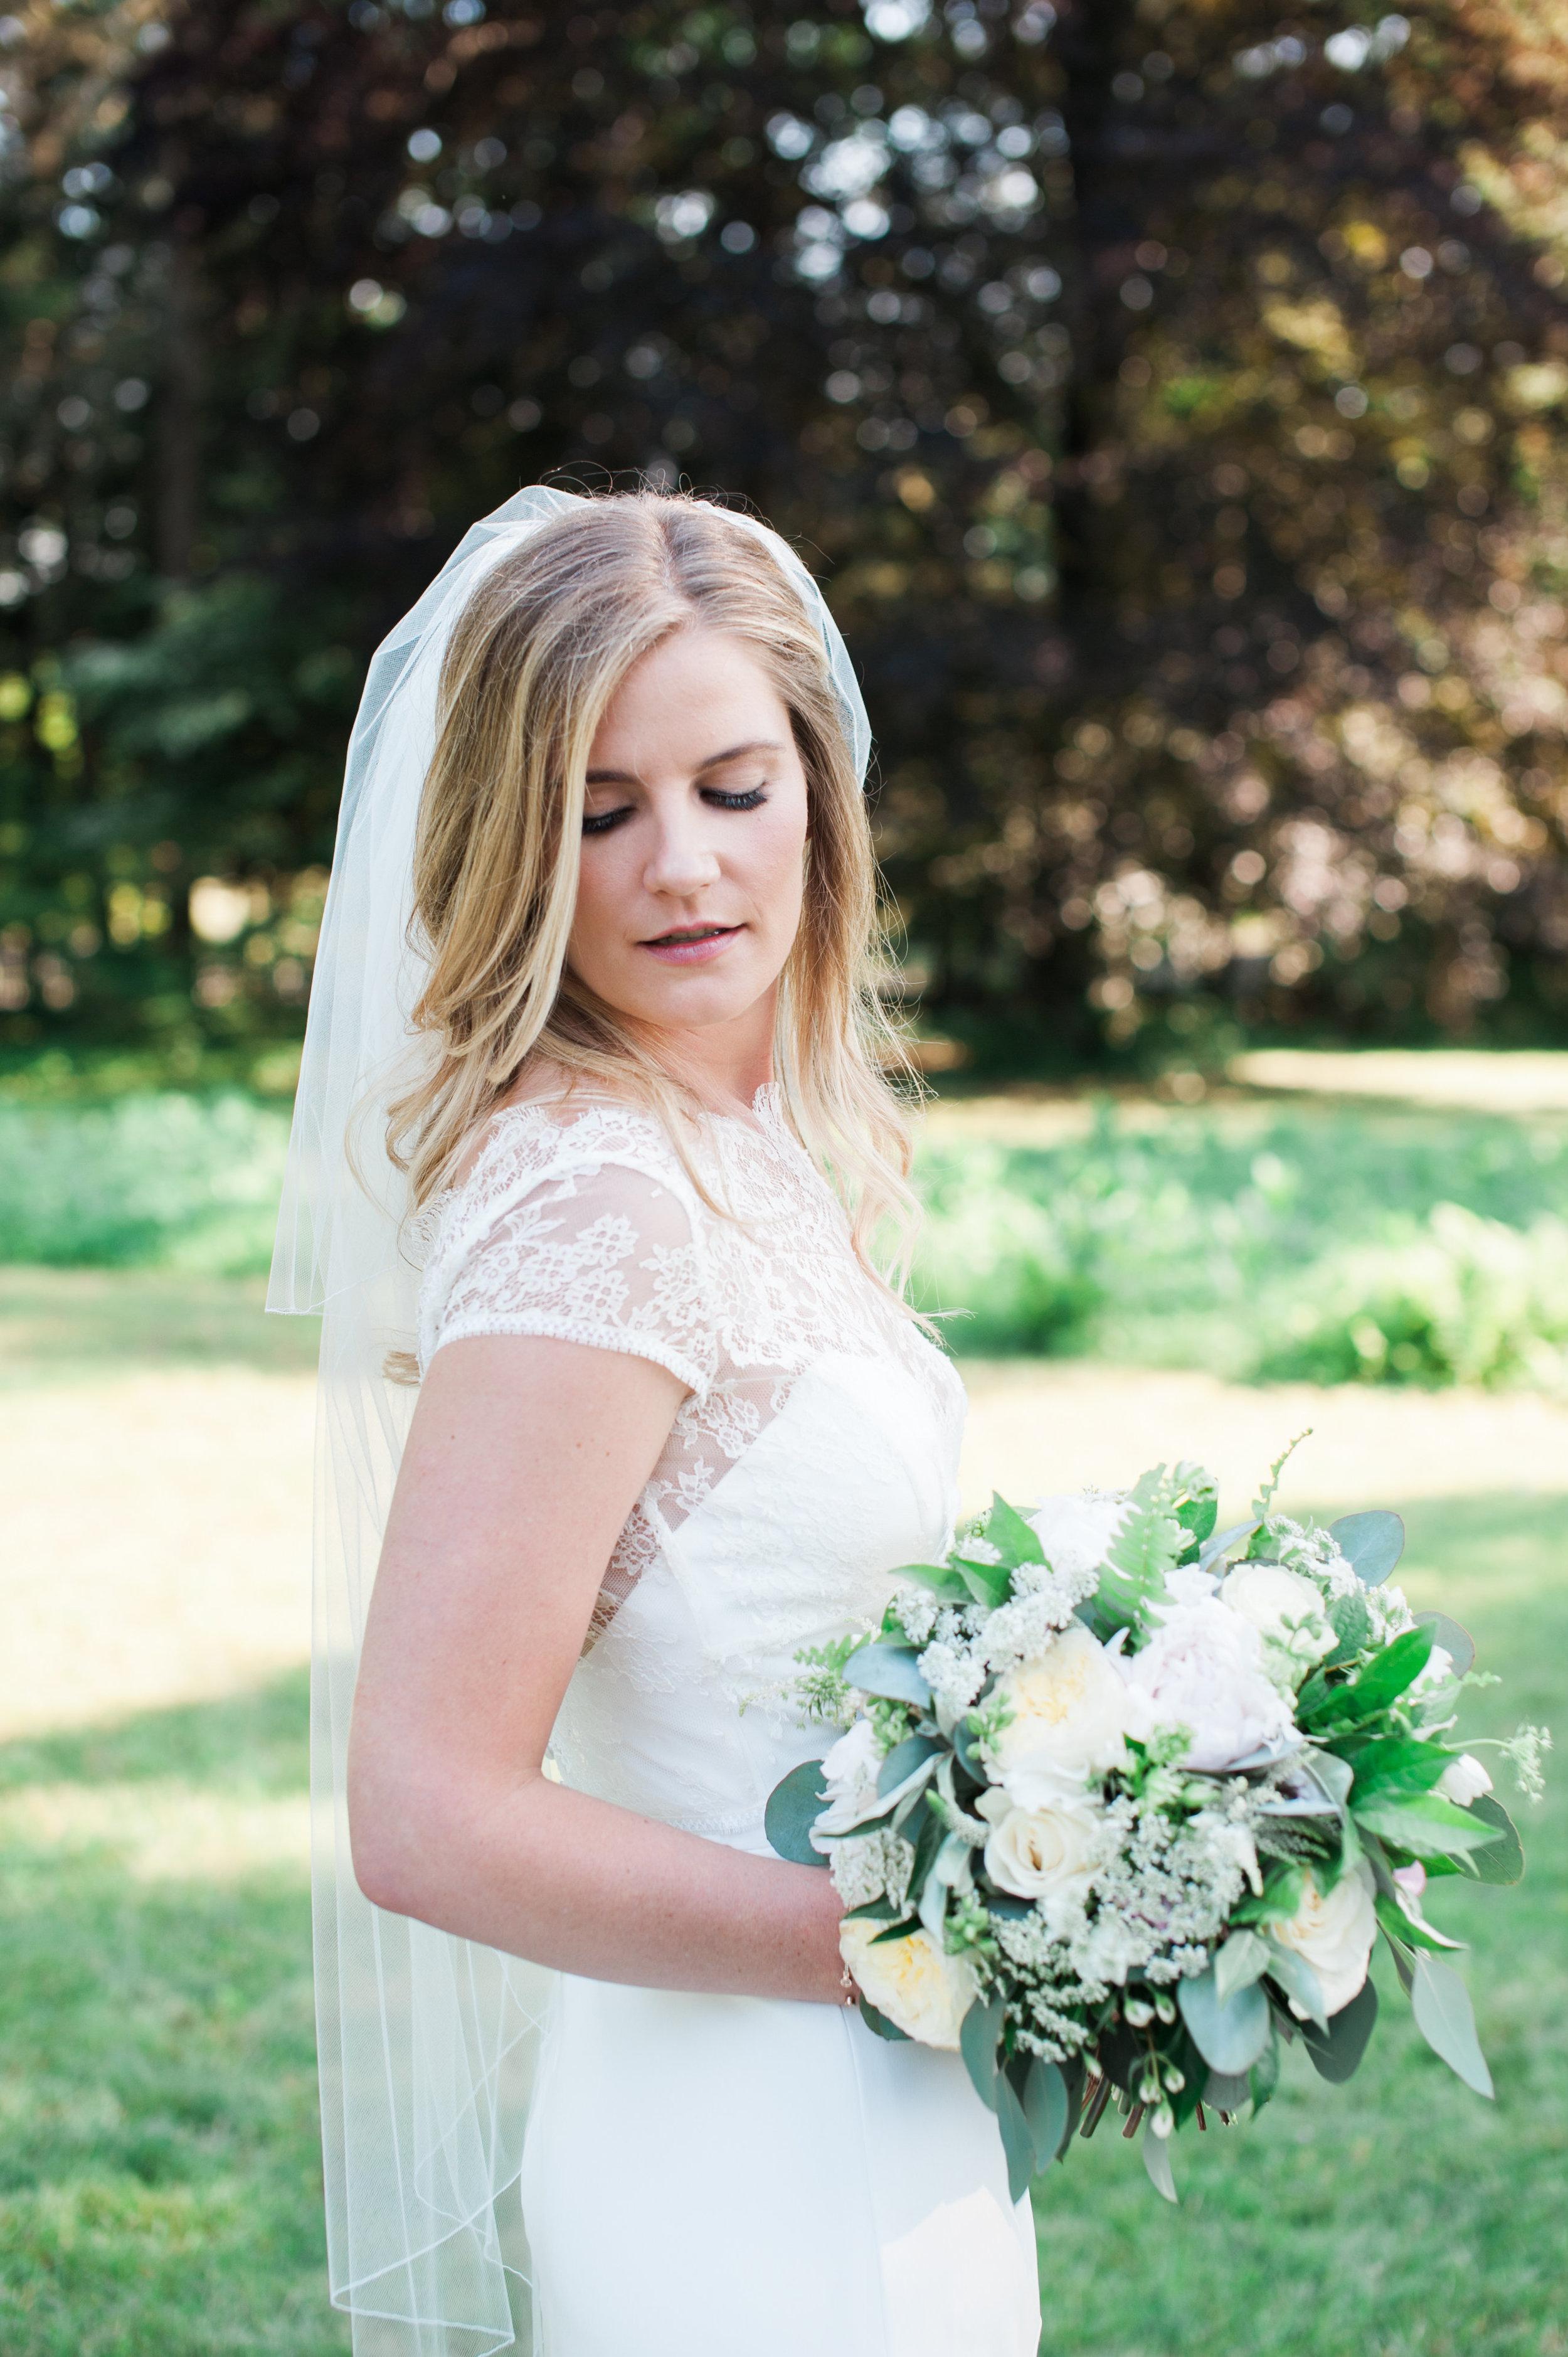 HeidiLovesJeff-Photographer s Favorites-0043.jpg